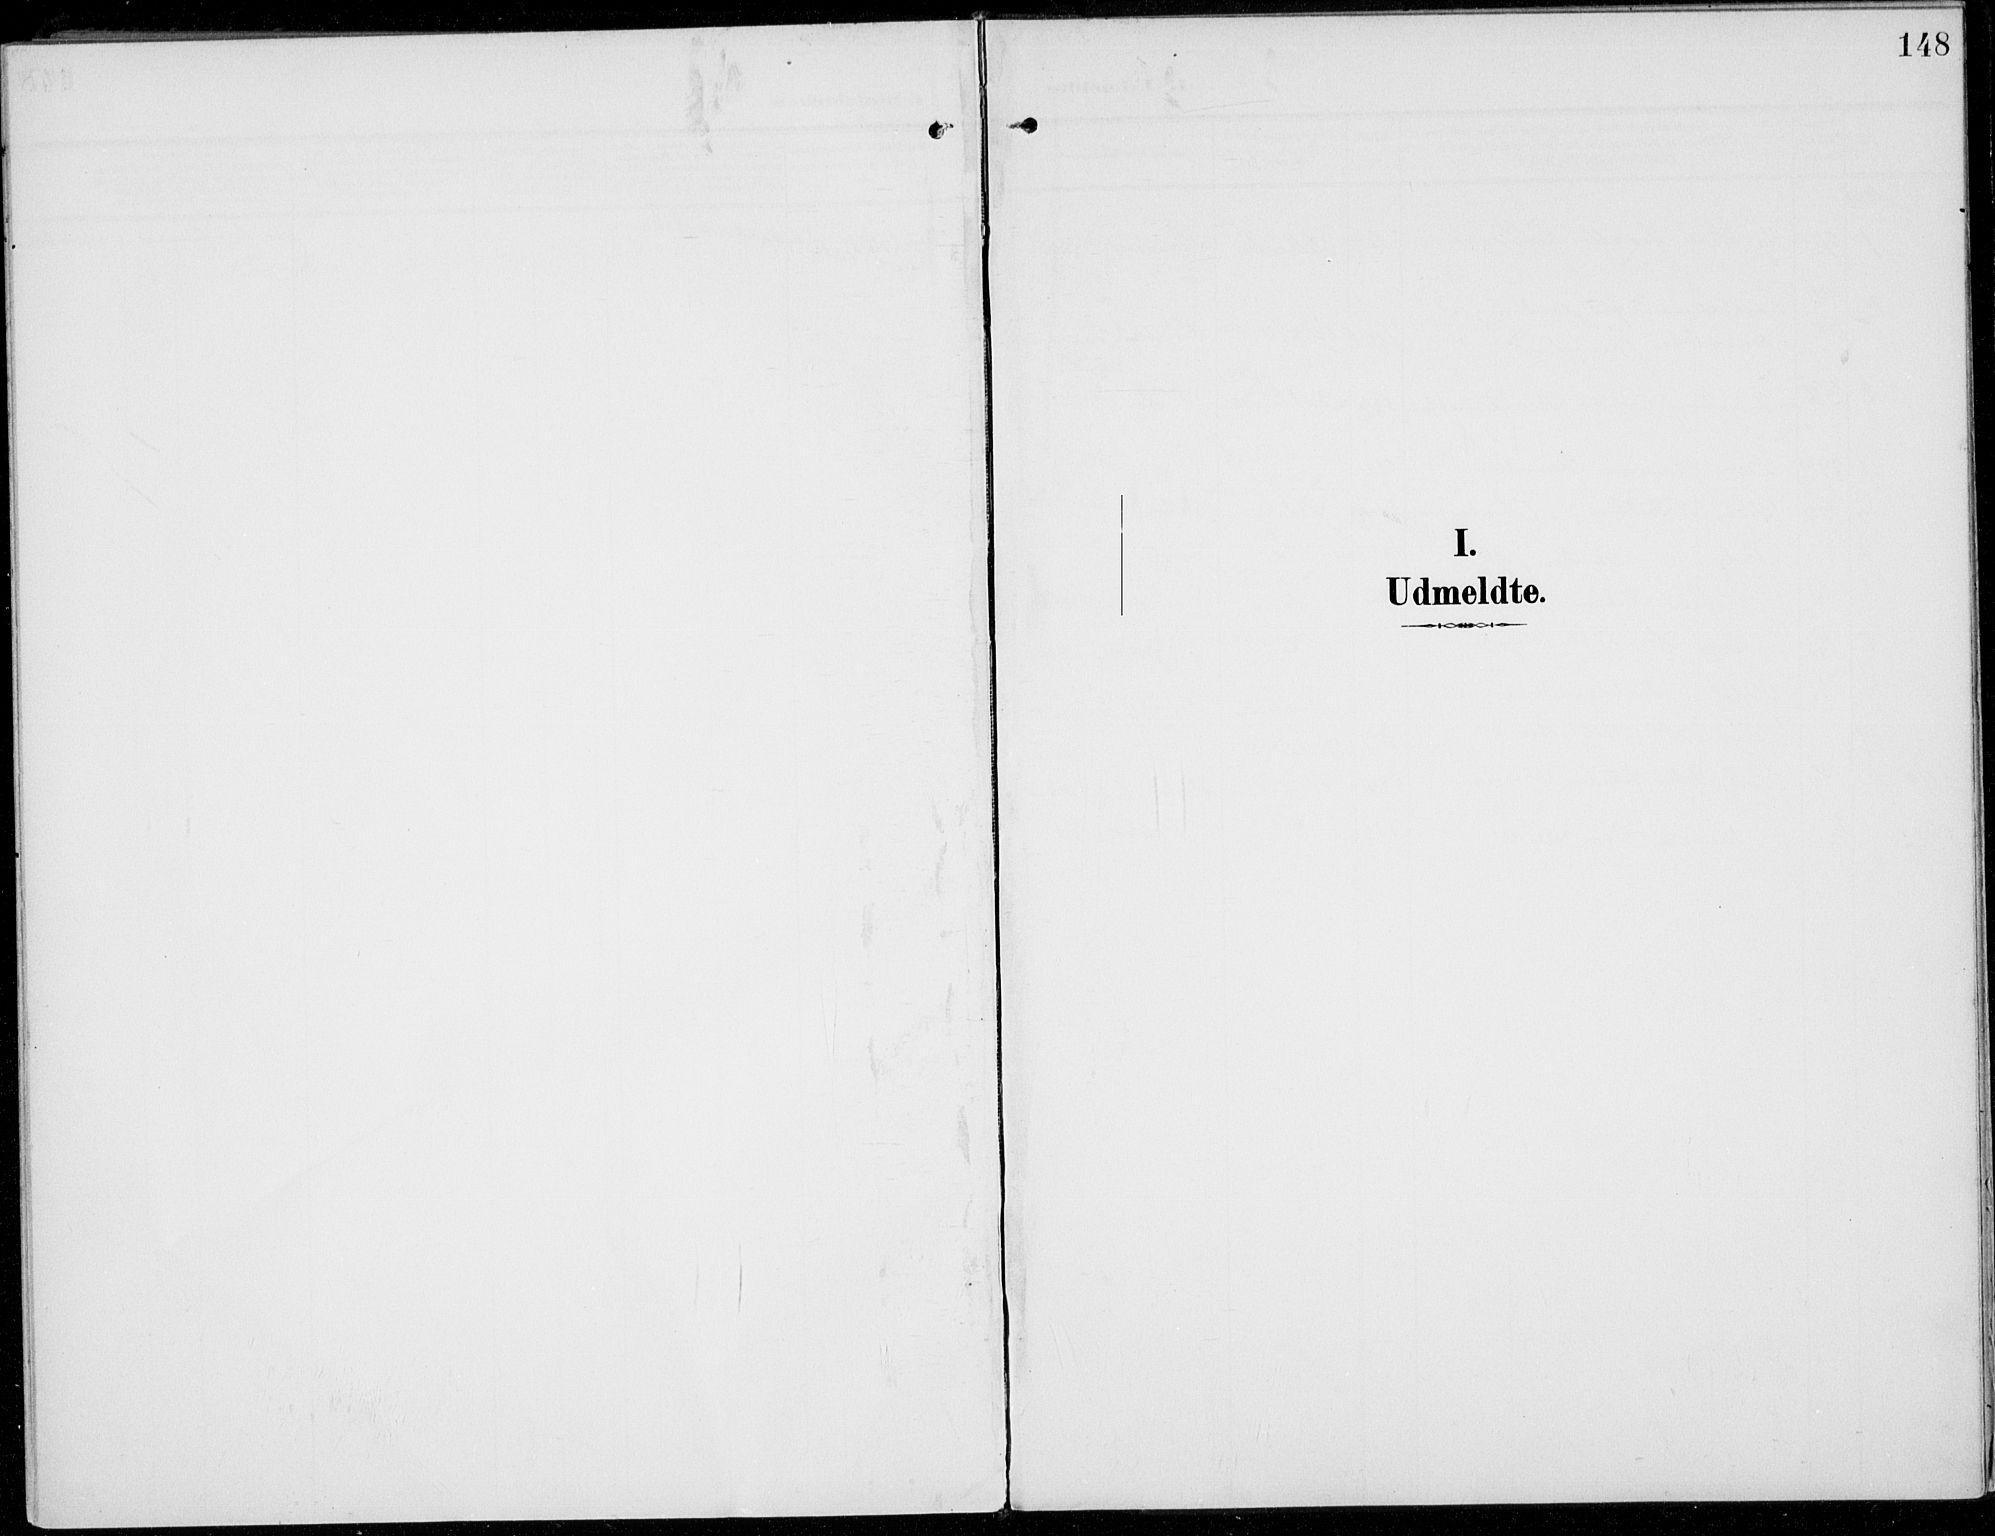 SAH, Sel prestekontor, Ministerialbok nr. 1, 1905-1922, s. 148